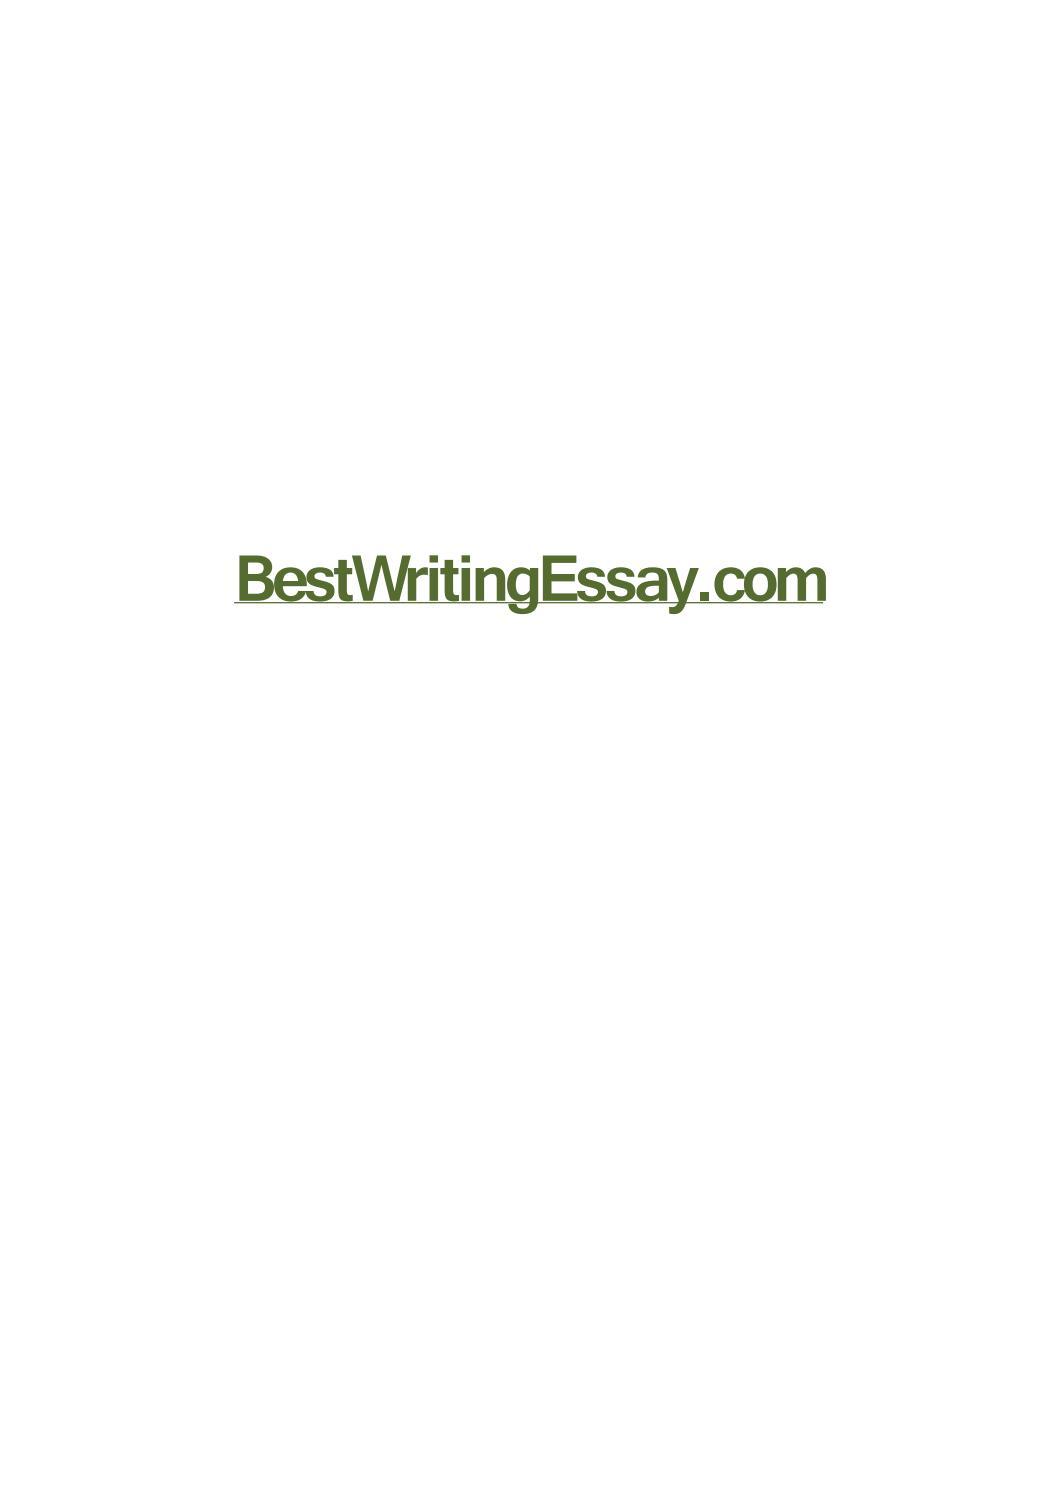 Esl speech editor service